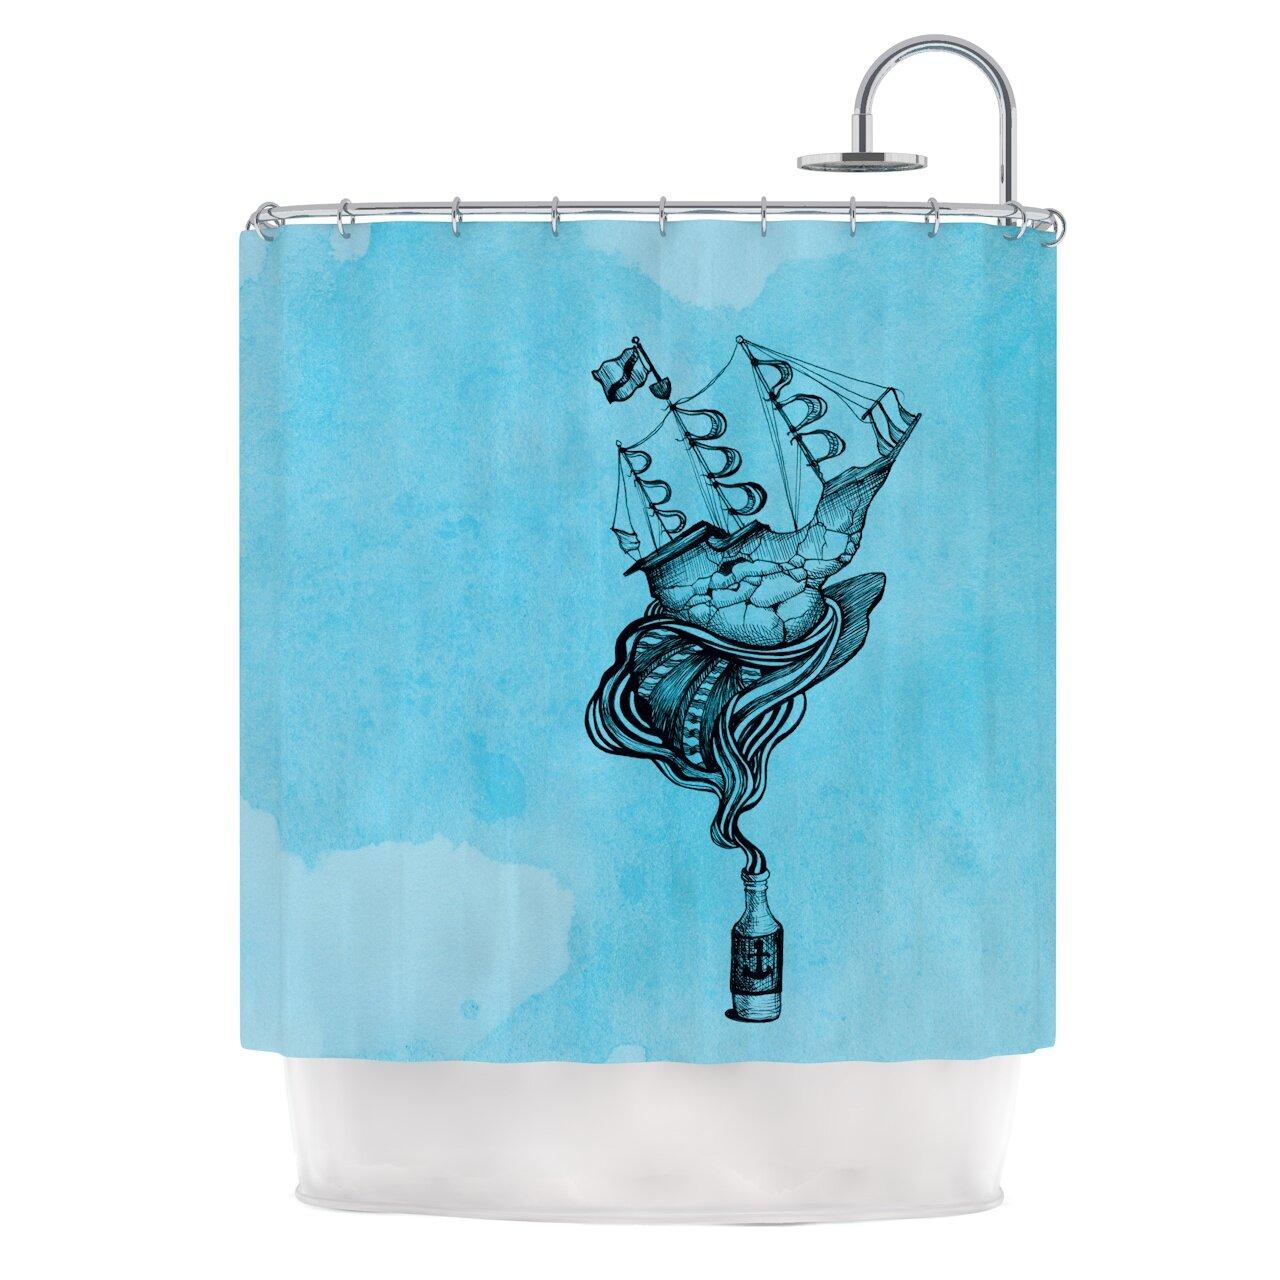 KESS InHouse All Aboard Shower Curtain